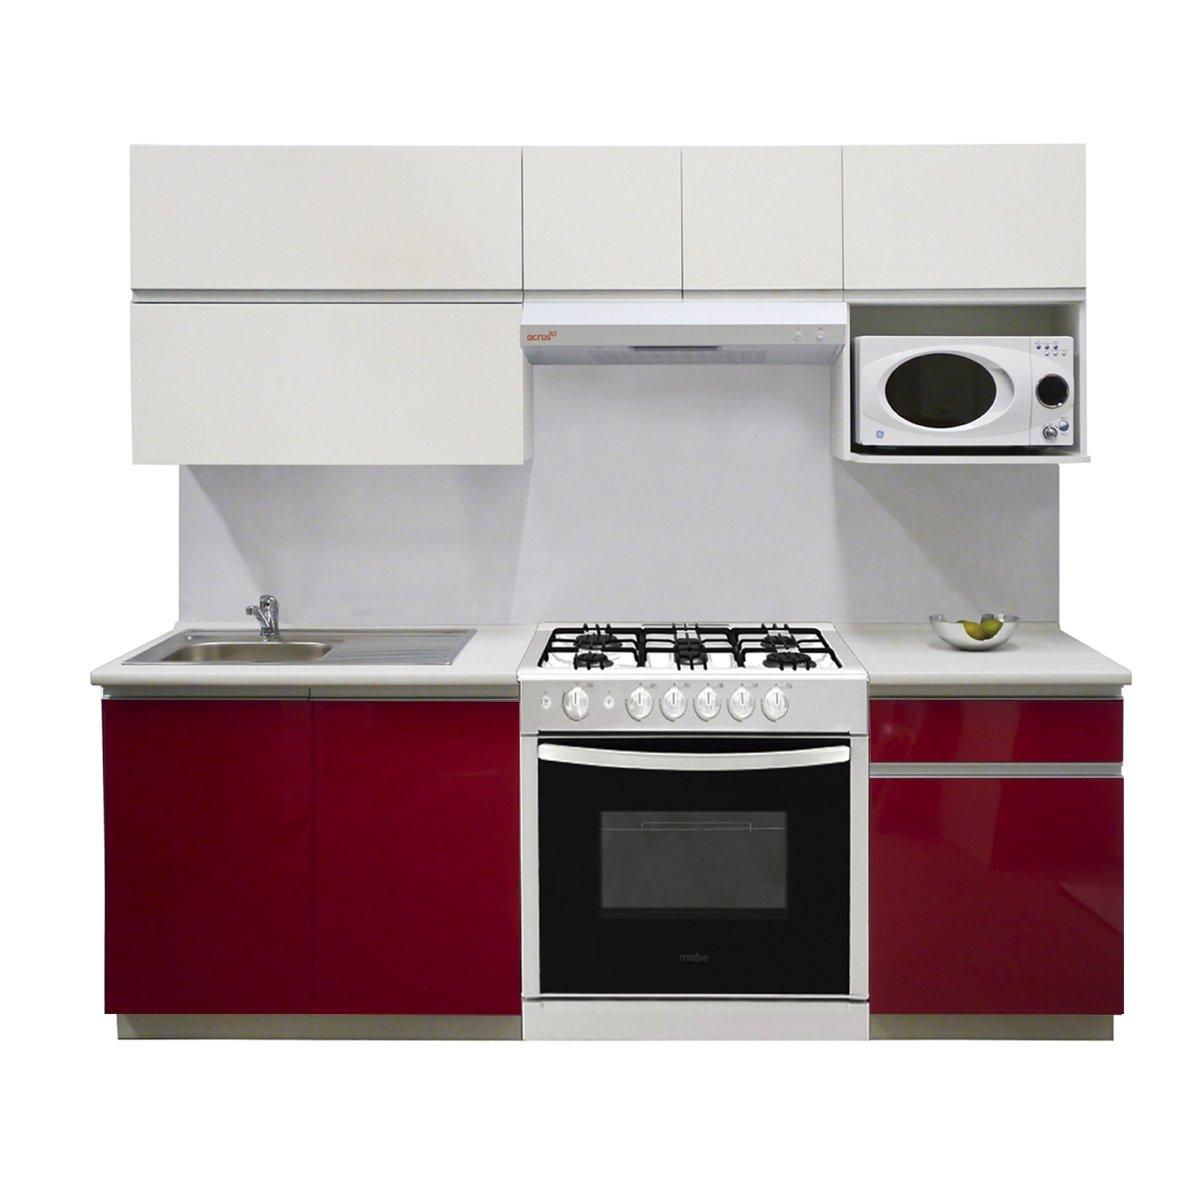 Cocina modular brendola ferreti sears com mx for Cocinas de 2 metros